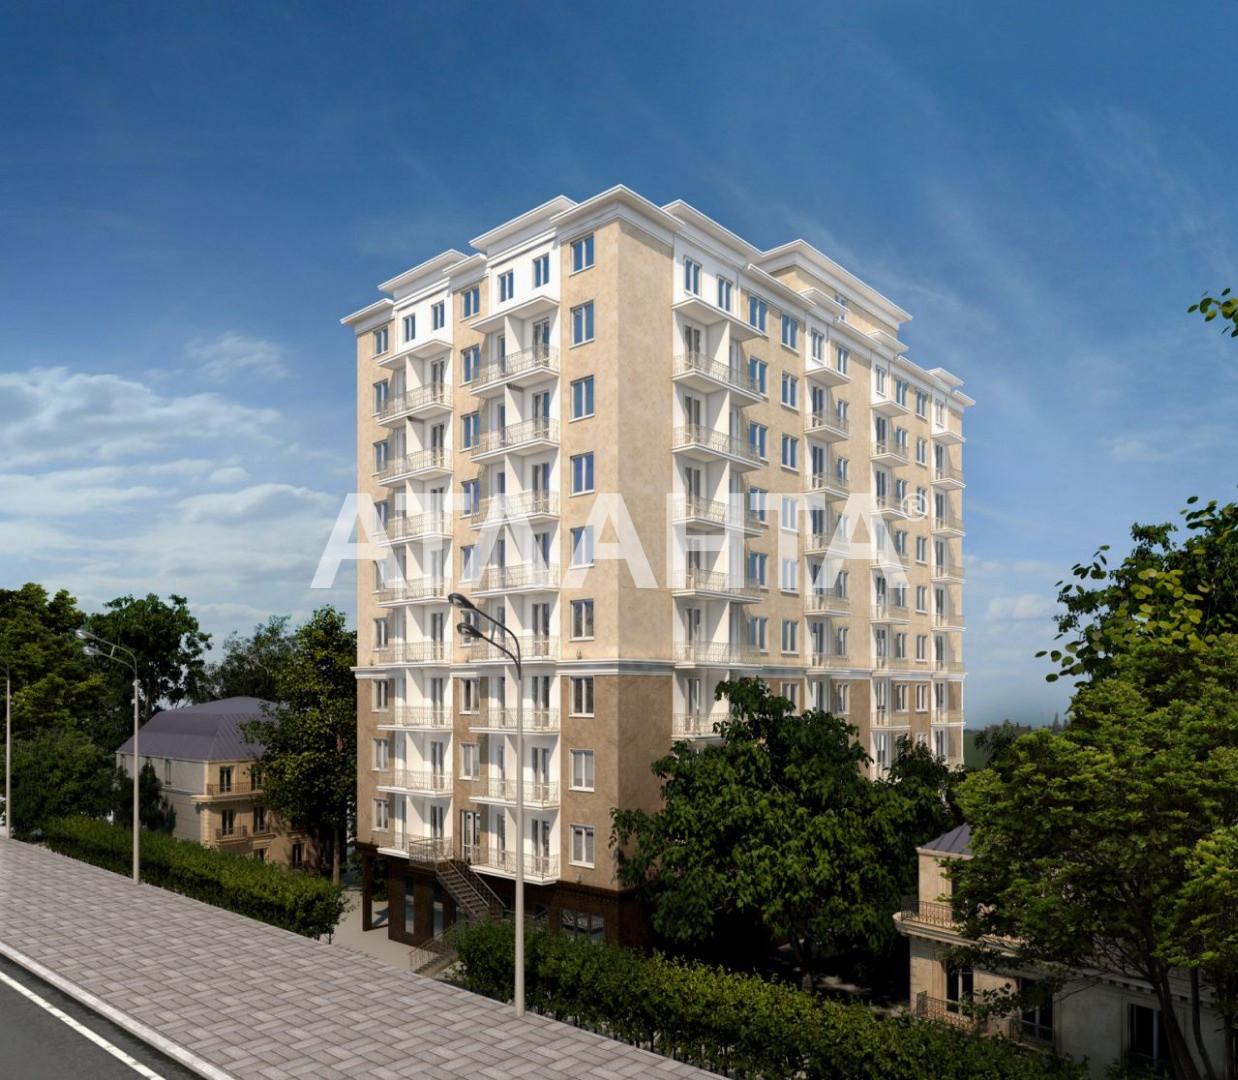 Продается 1-комнатная Квартира на ул. Балковская (Фрунзе) — 21 910 у.е. (фото №3)